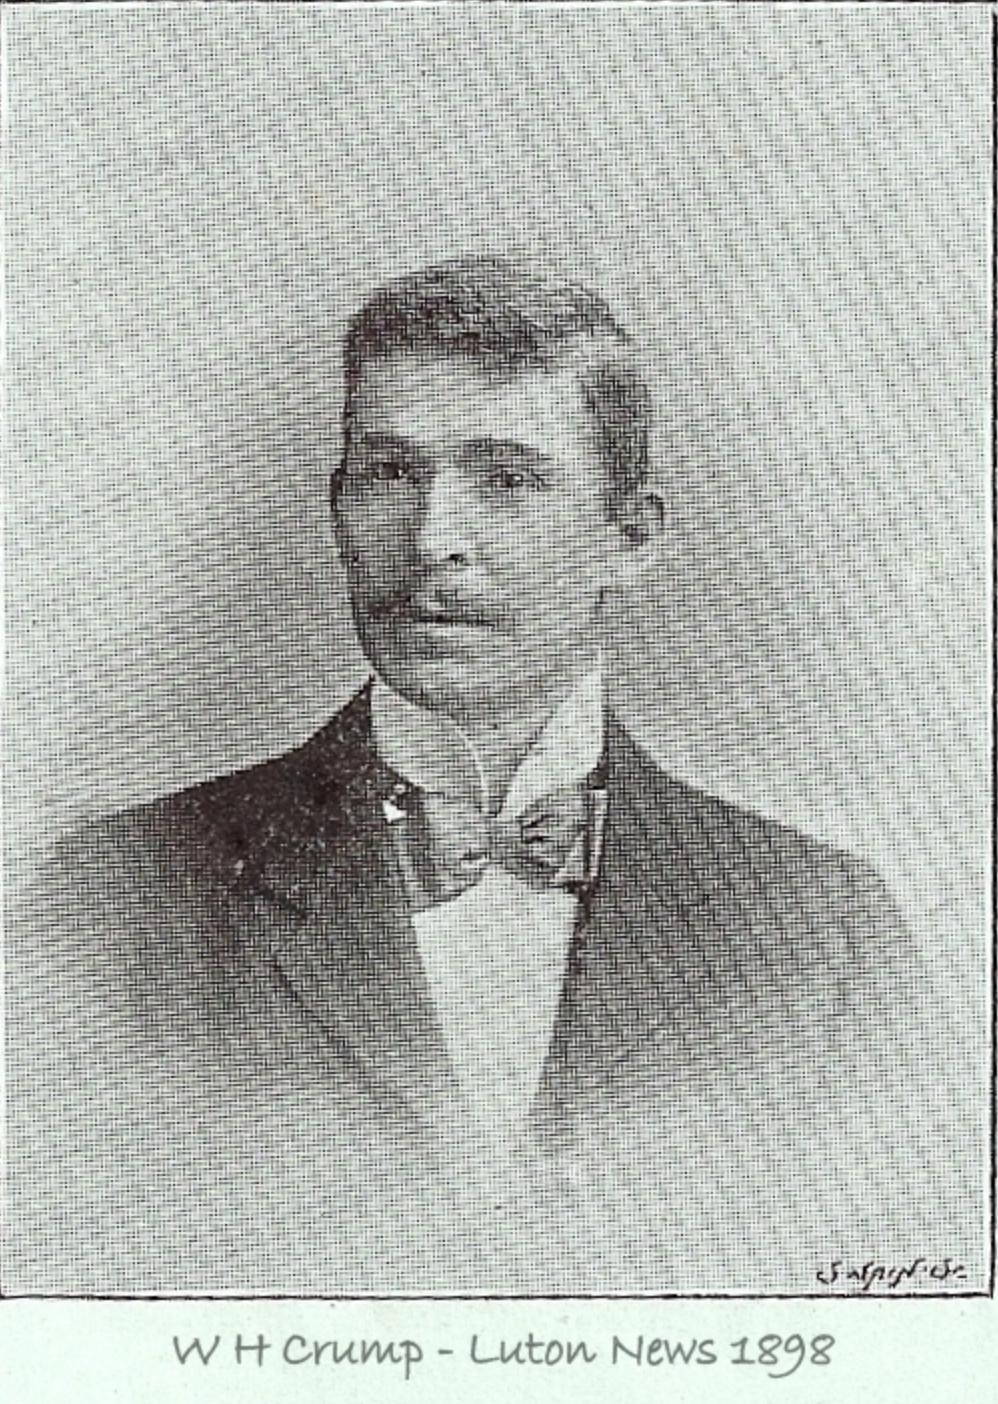 Harry Crump 1898